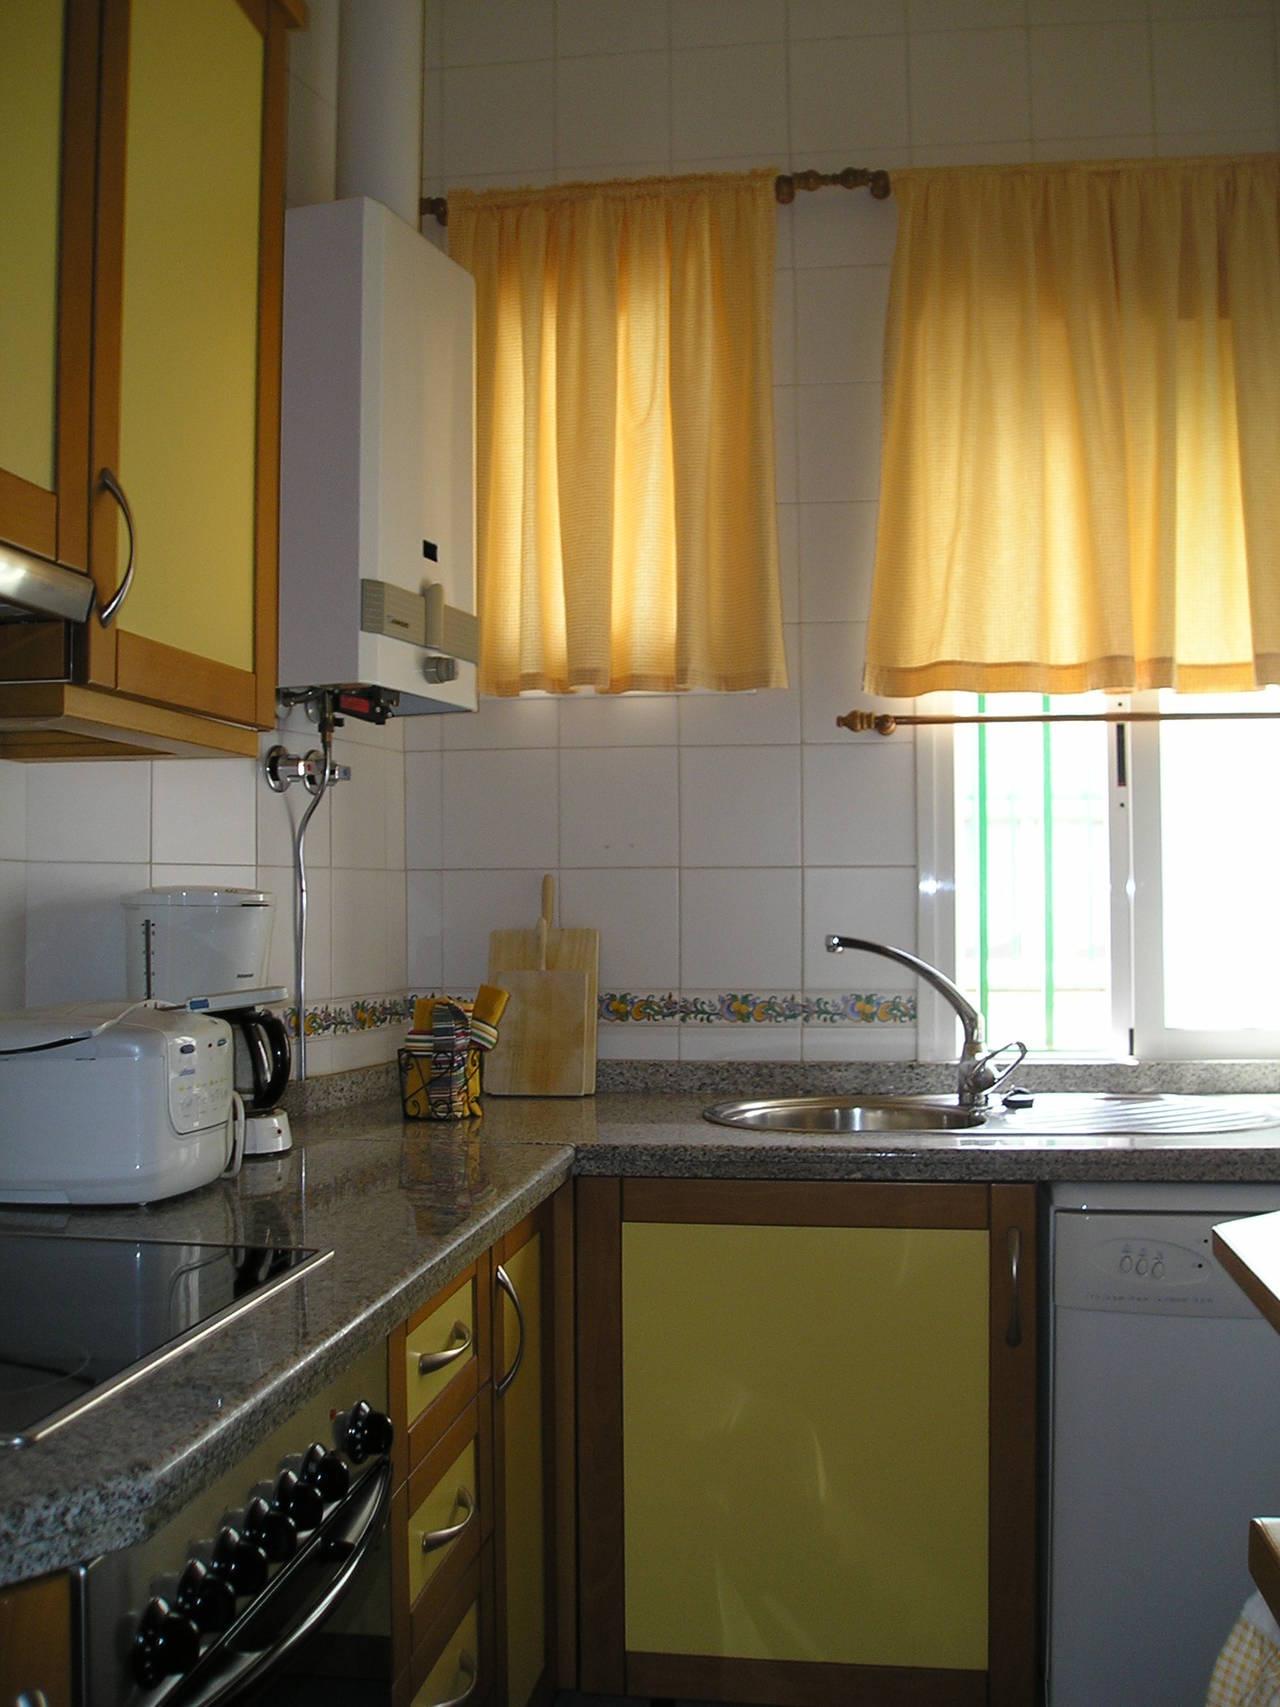 alquiler apartamento. Calle San Juan de Dios 17, 3º d. Sevilla  - Foto 8